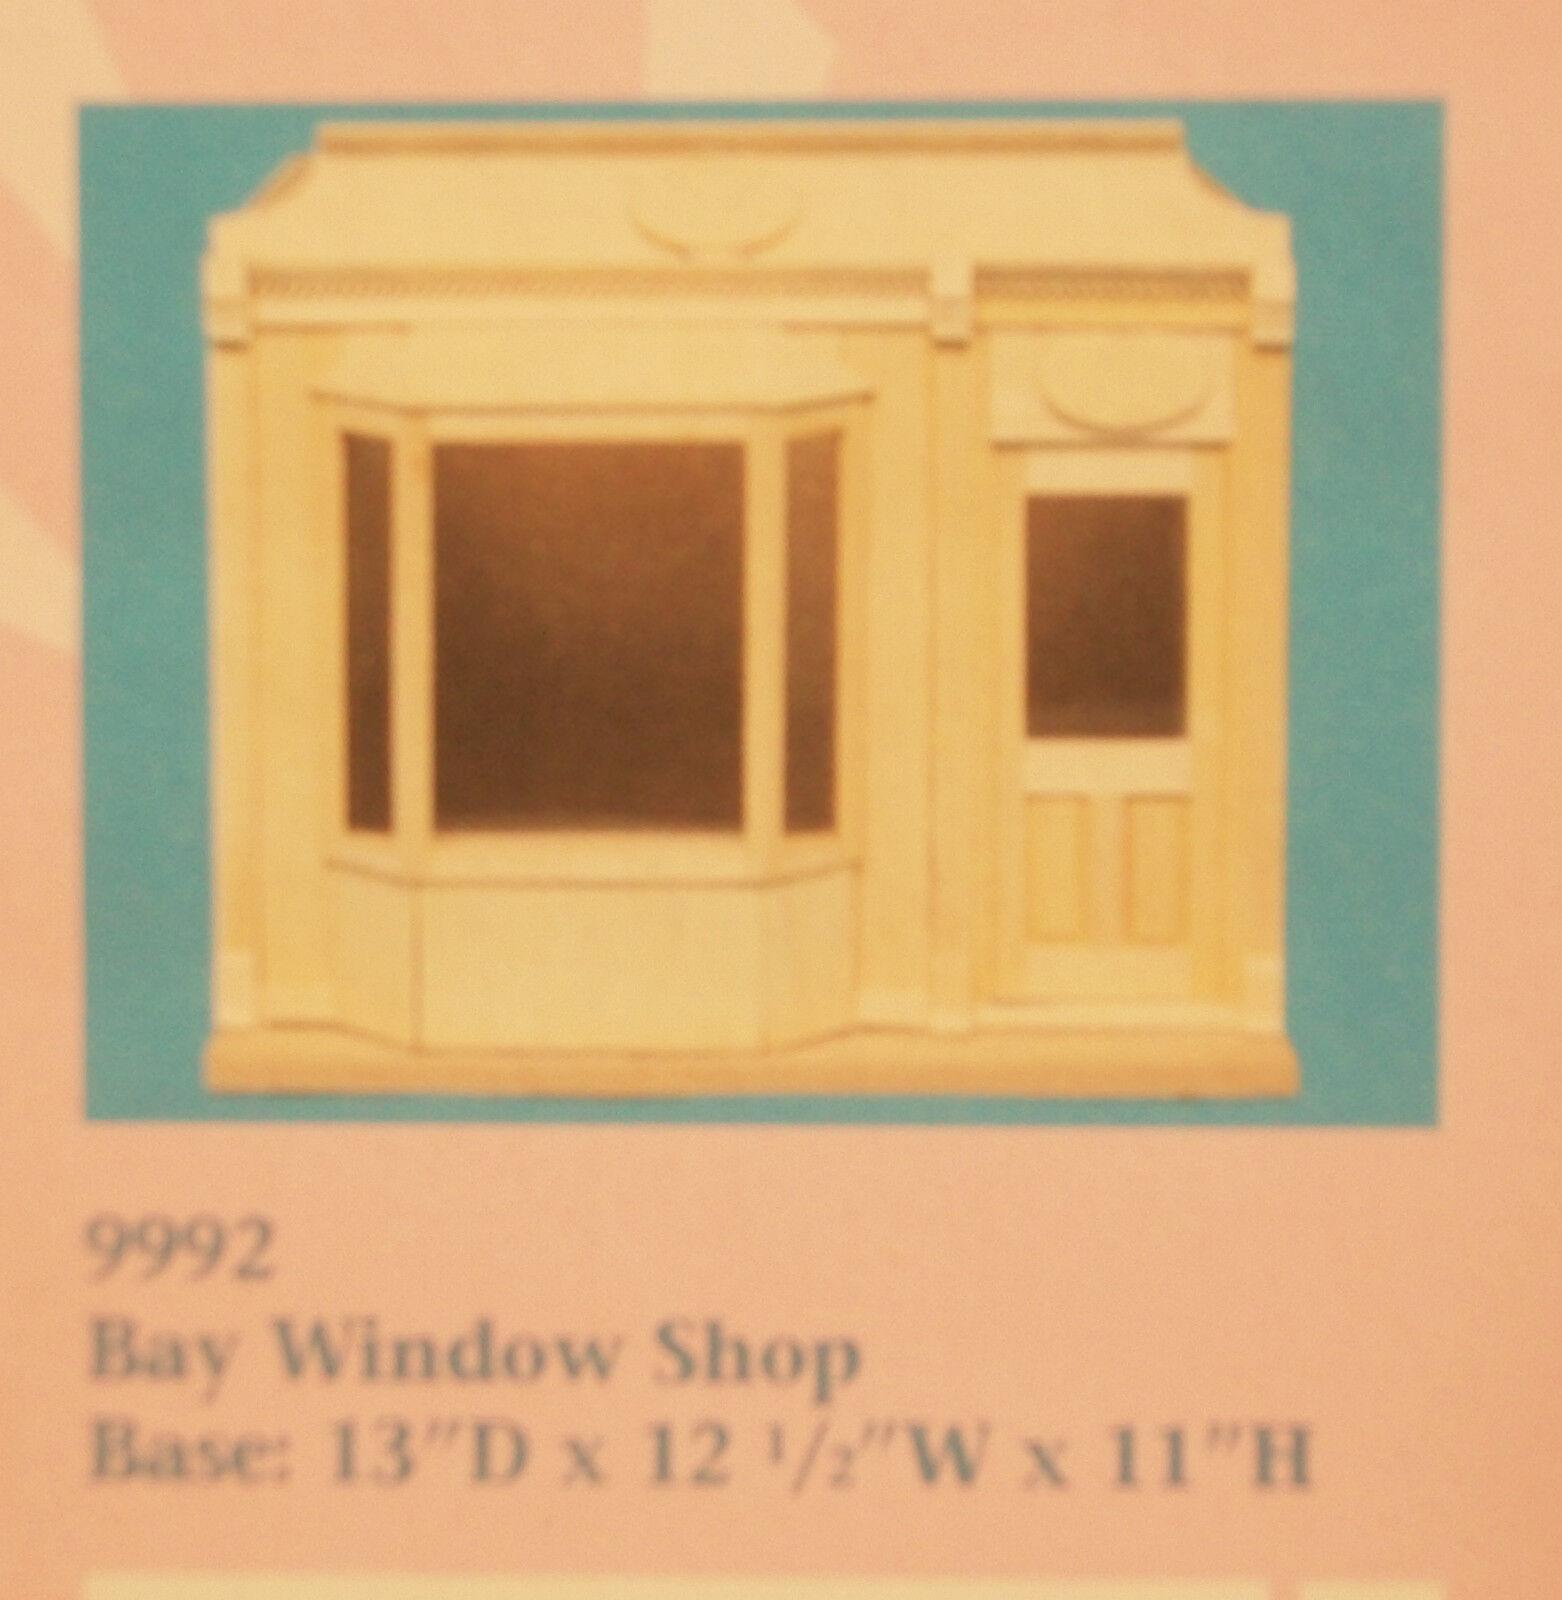 Bay Window Shop Kit por Houseworks 9992 sin Terminar Madera 1 12 Escala